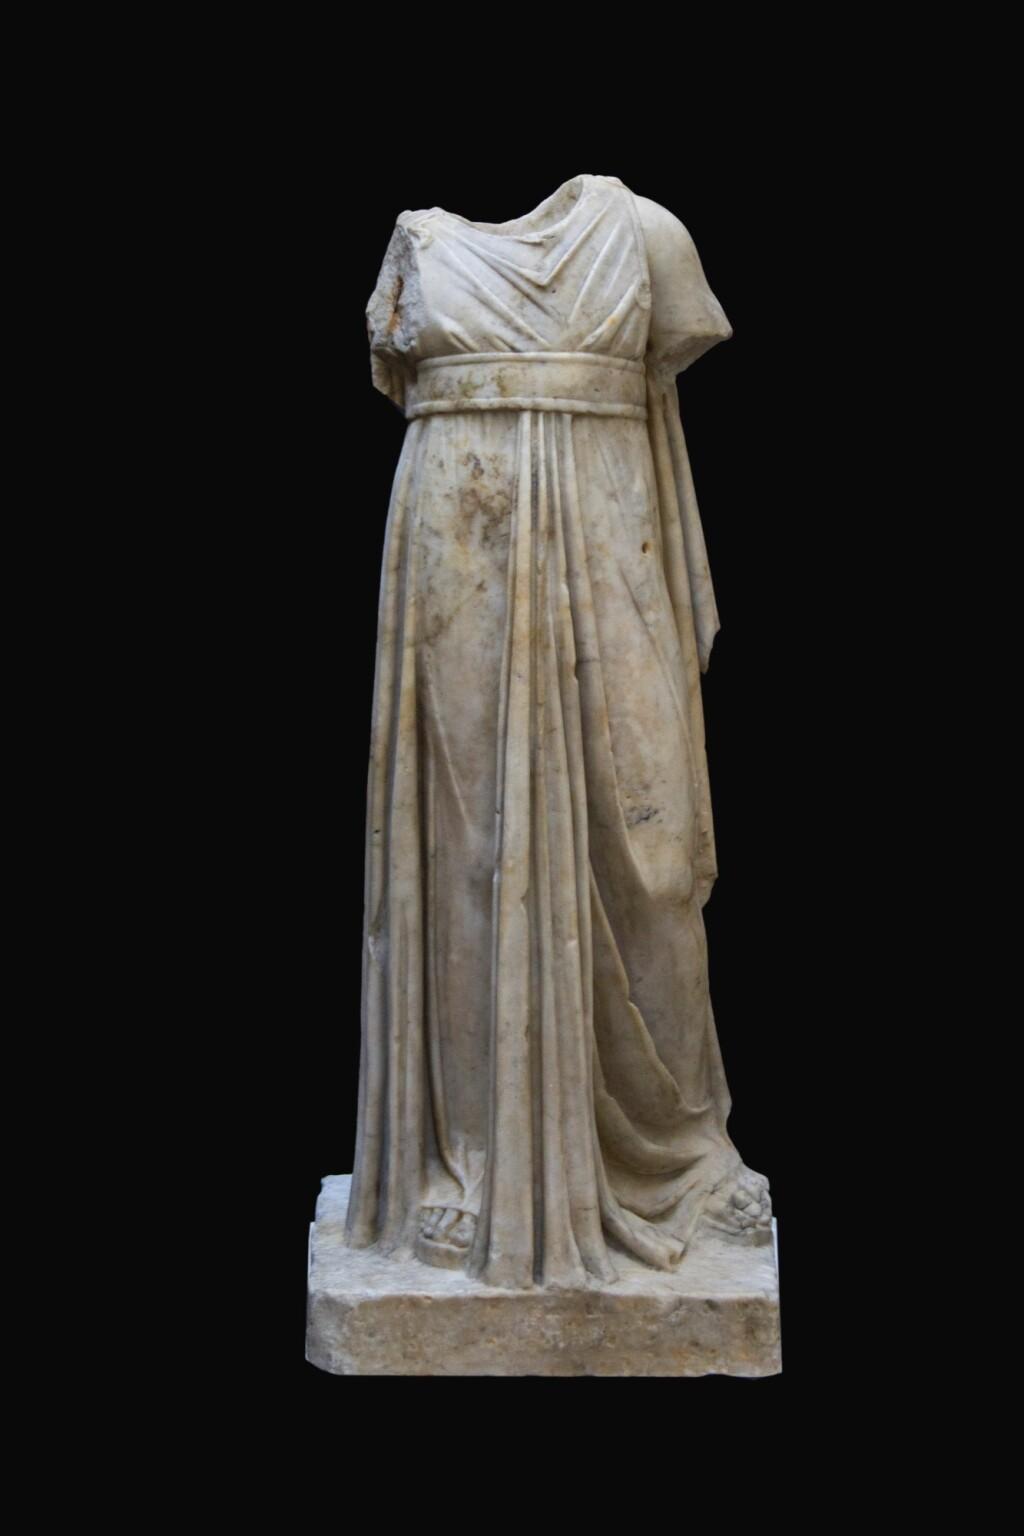 A ROMAN MARBLE FIGURE OF APOLLO KITHAROIDOS, CIRCA 2ND CENTURY A.D.